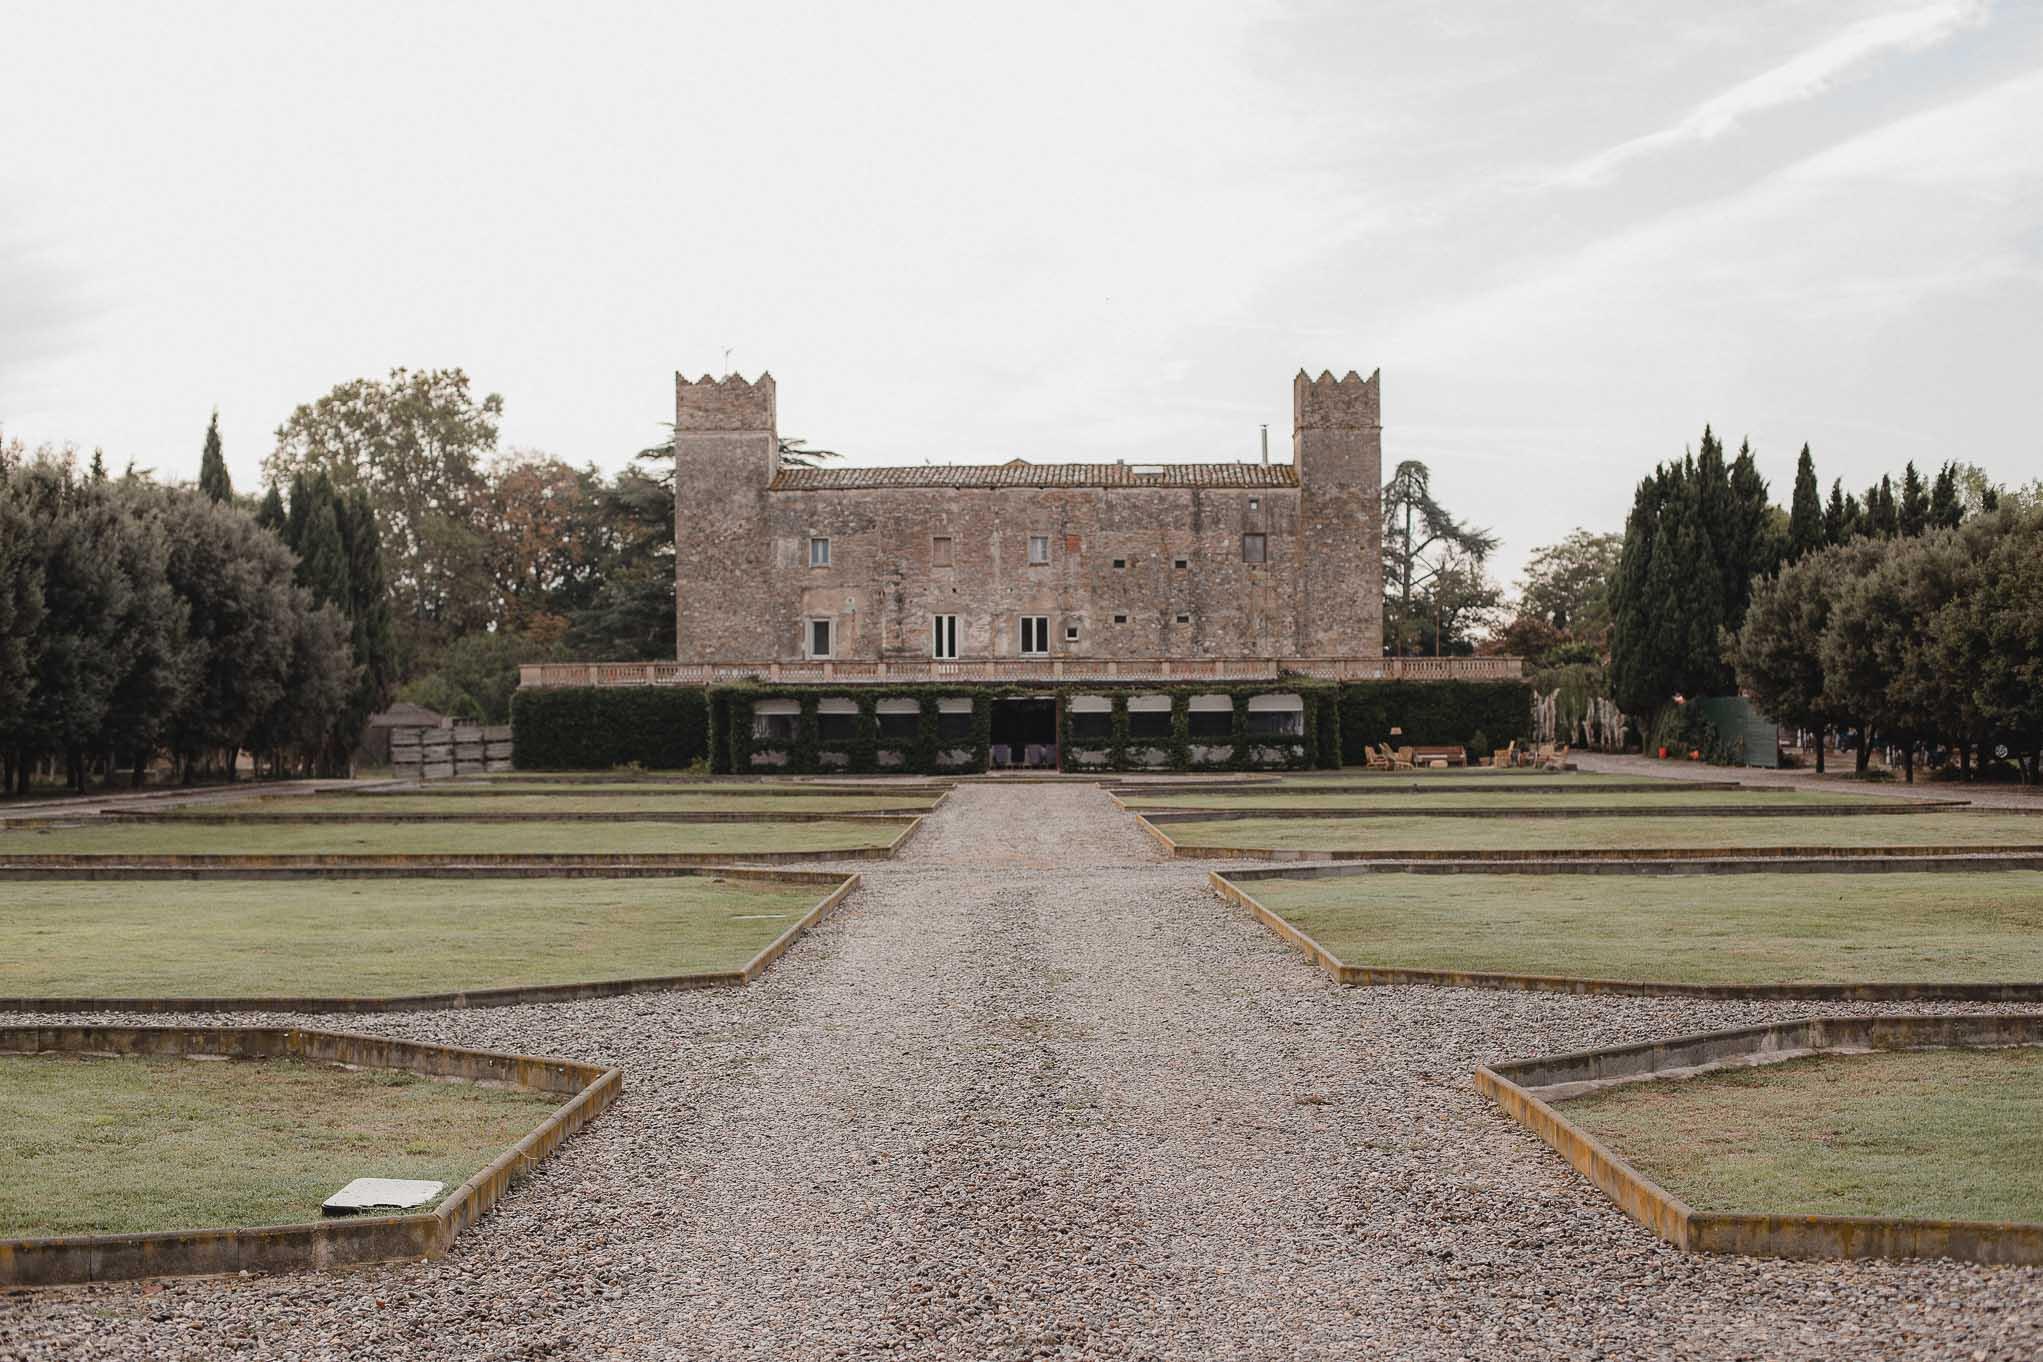 Casarse en Castell de Caramany, jardines para boda en Girona, Castillos para casarse